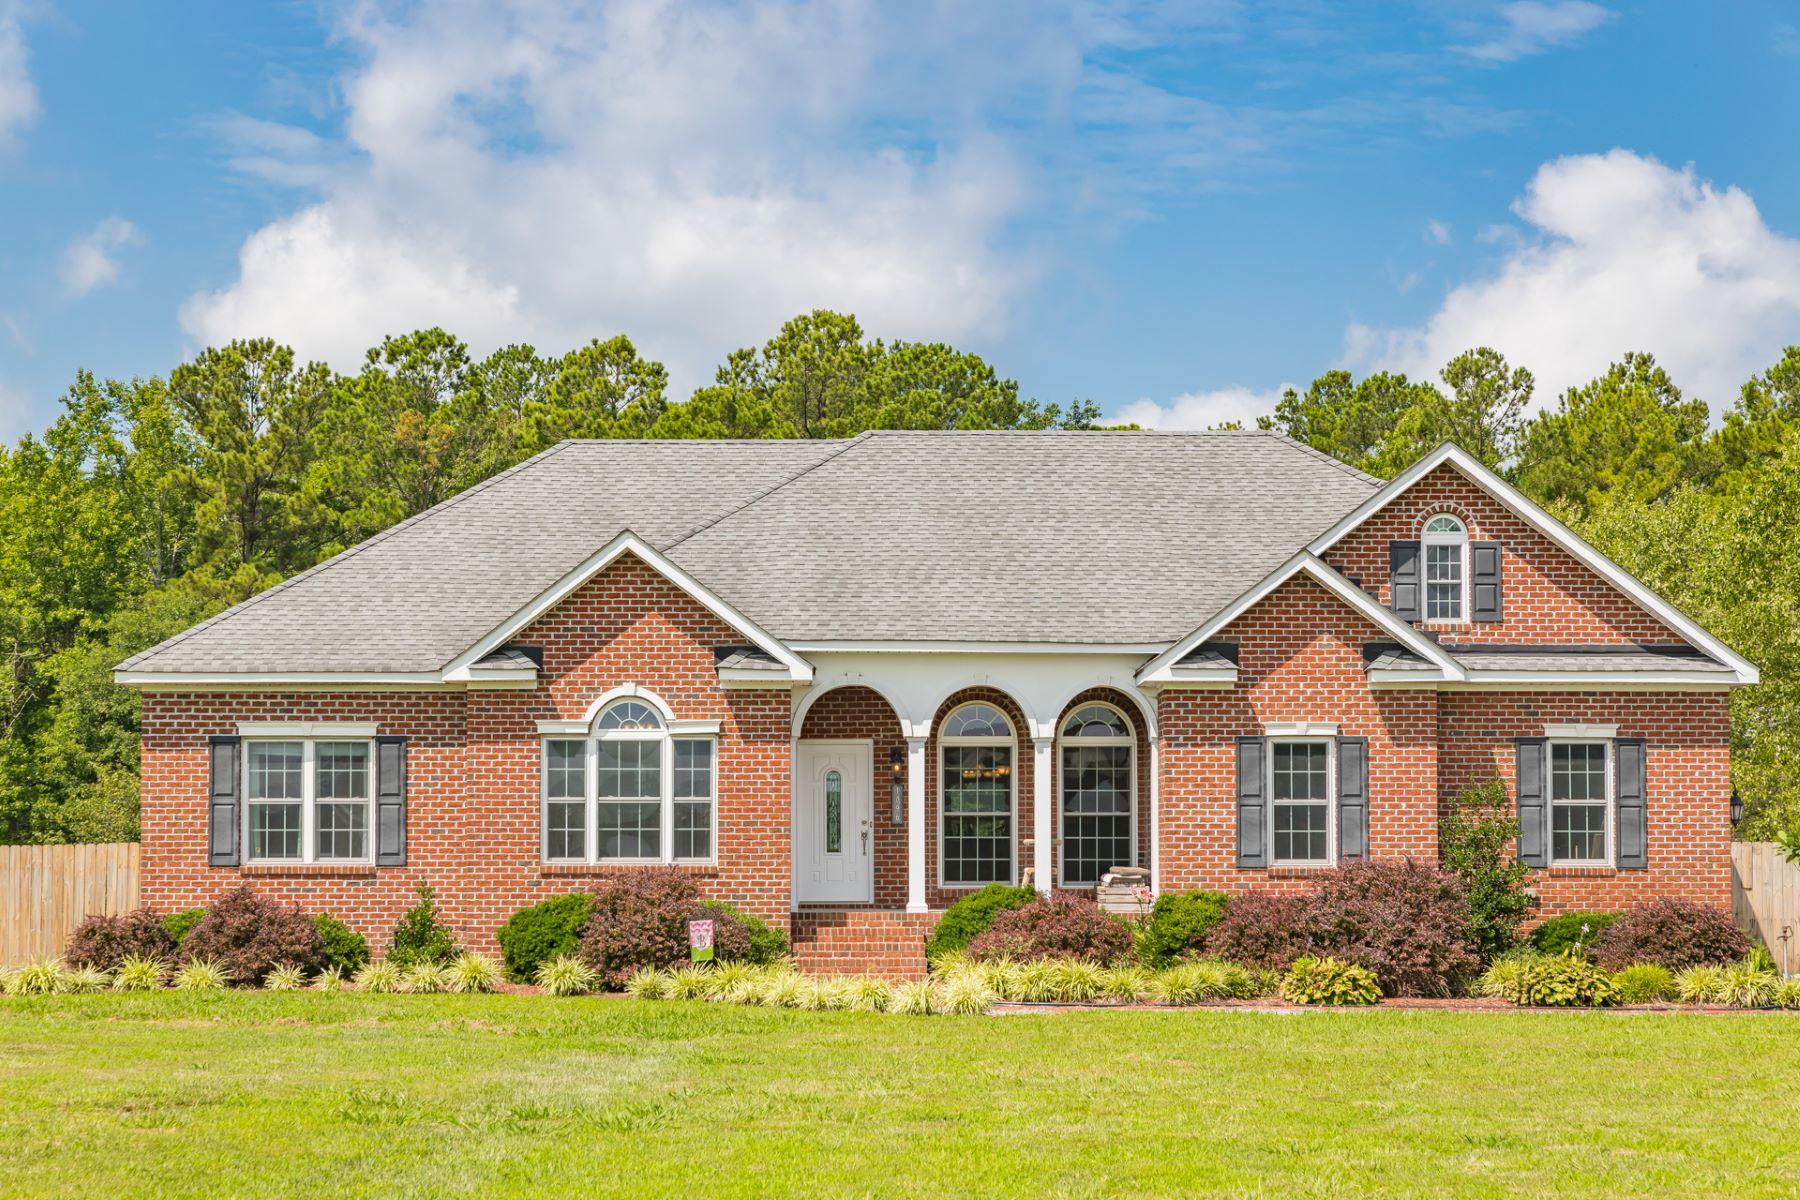 Single Family Homes για την Πώληση στο White Farm Surv 1096 NC Highway 32 N, Corapeake, Βορεια Καρολινα 27926 Ηνωμένες Πολιτείες